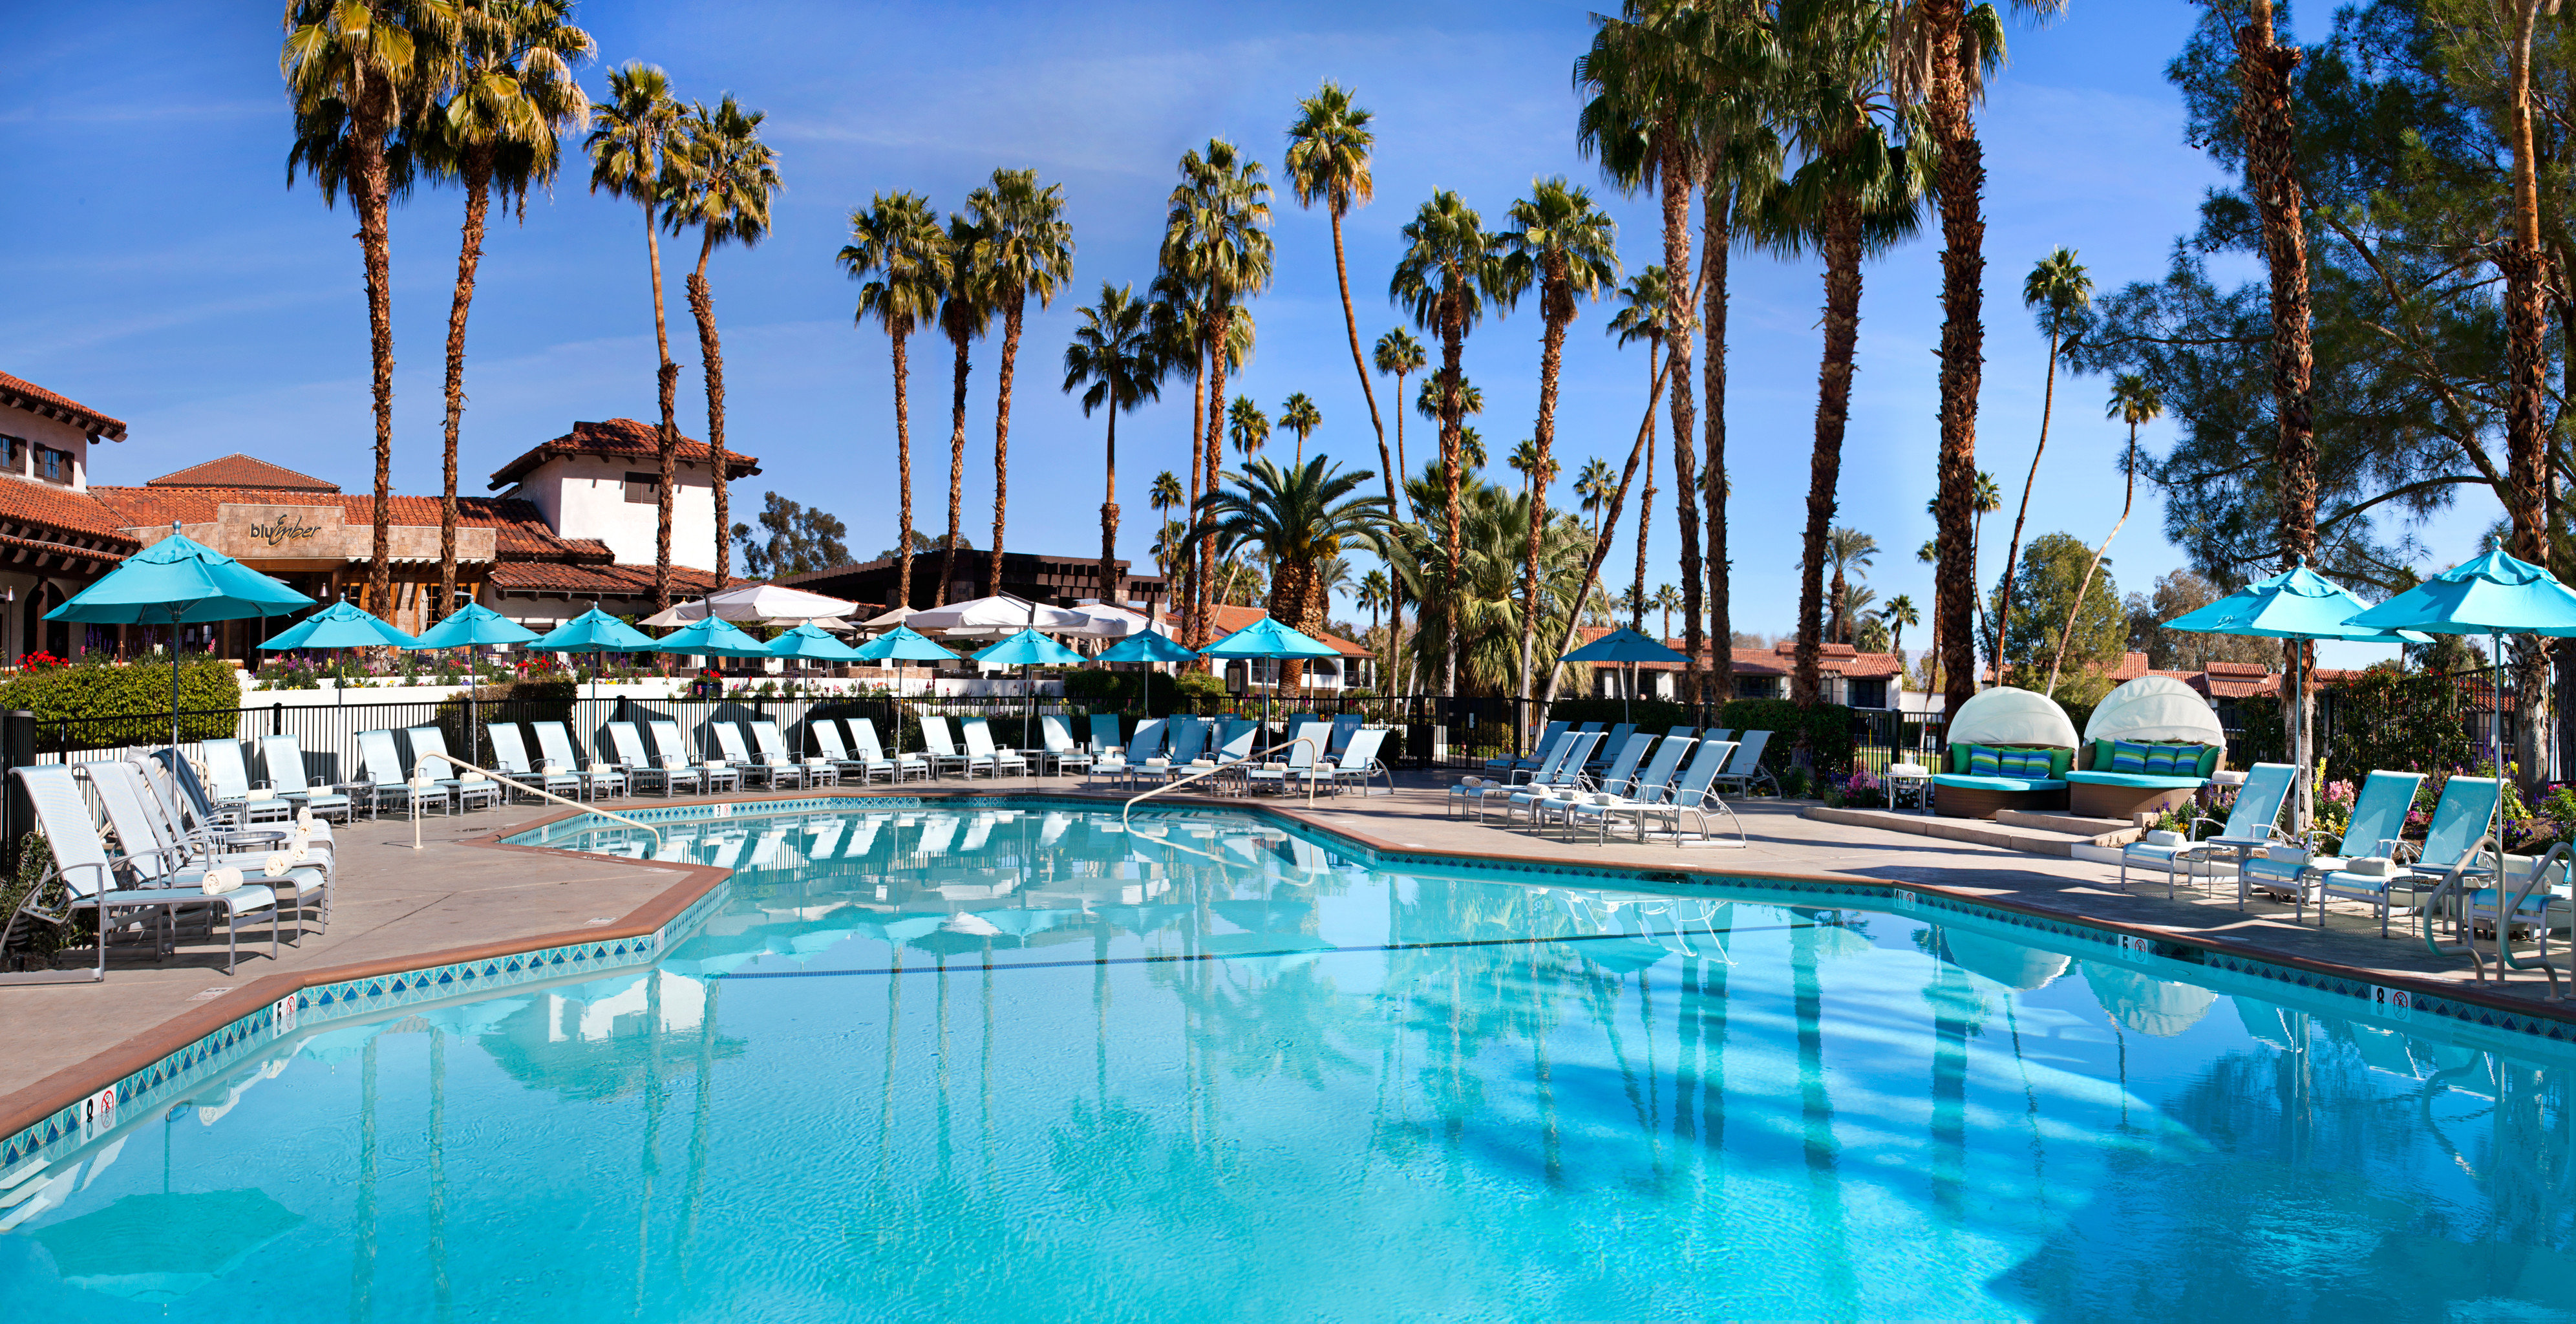 Lounge Luxury Pool tree sky umbrella swimming pool leisure palm Resort lined resort town Water park swimming